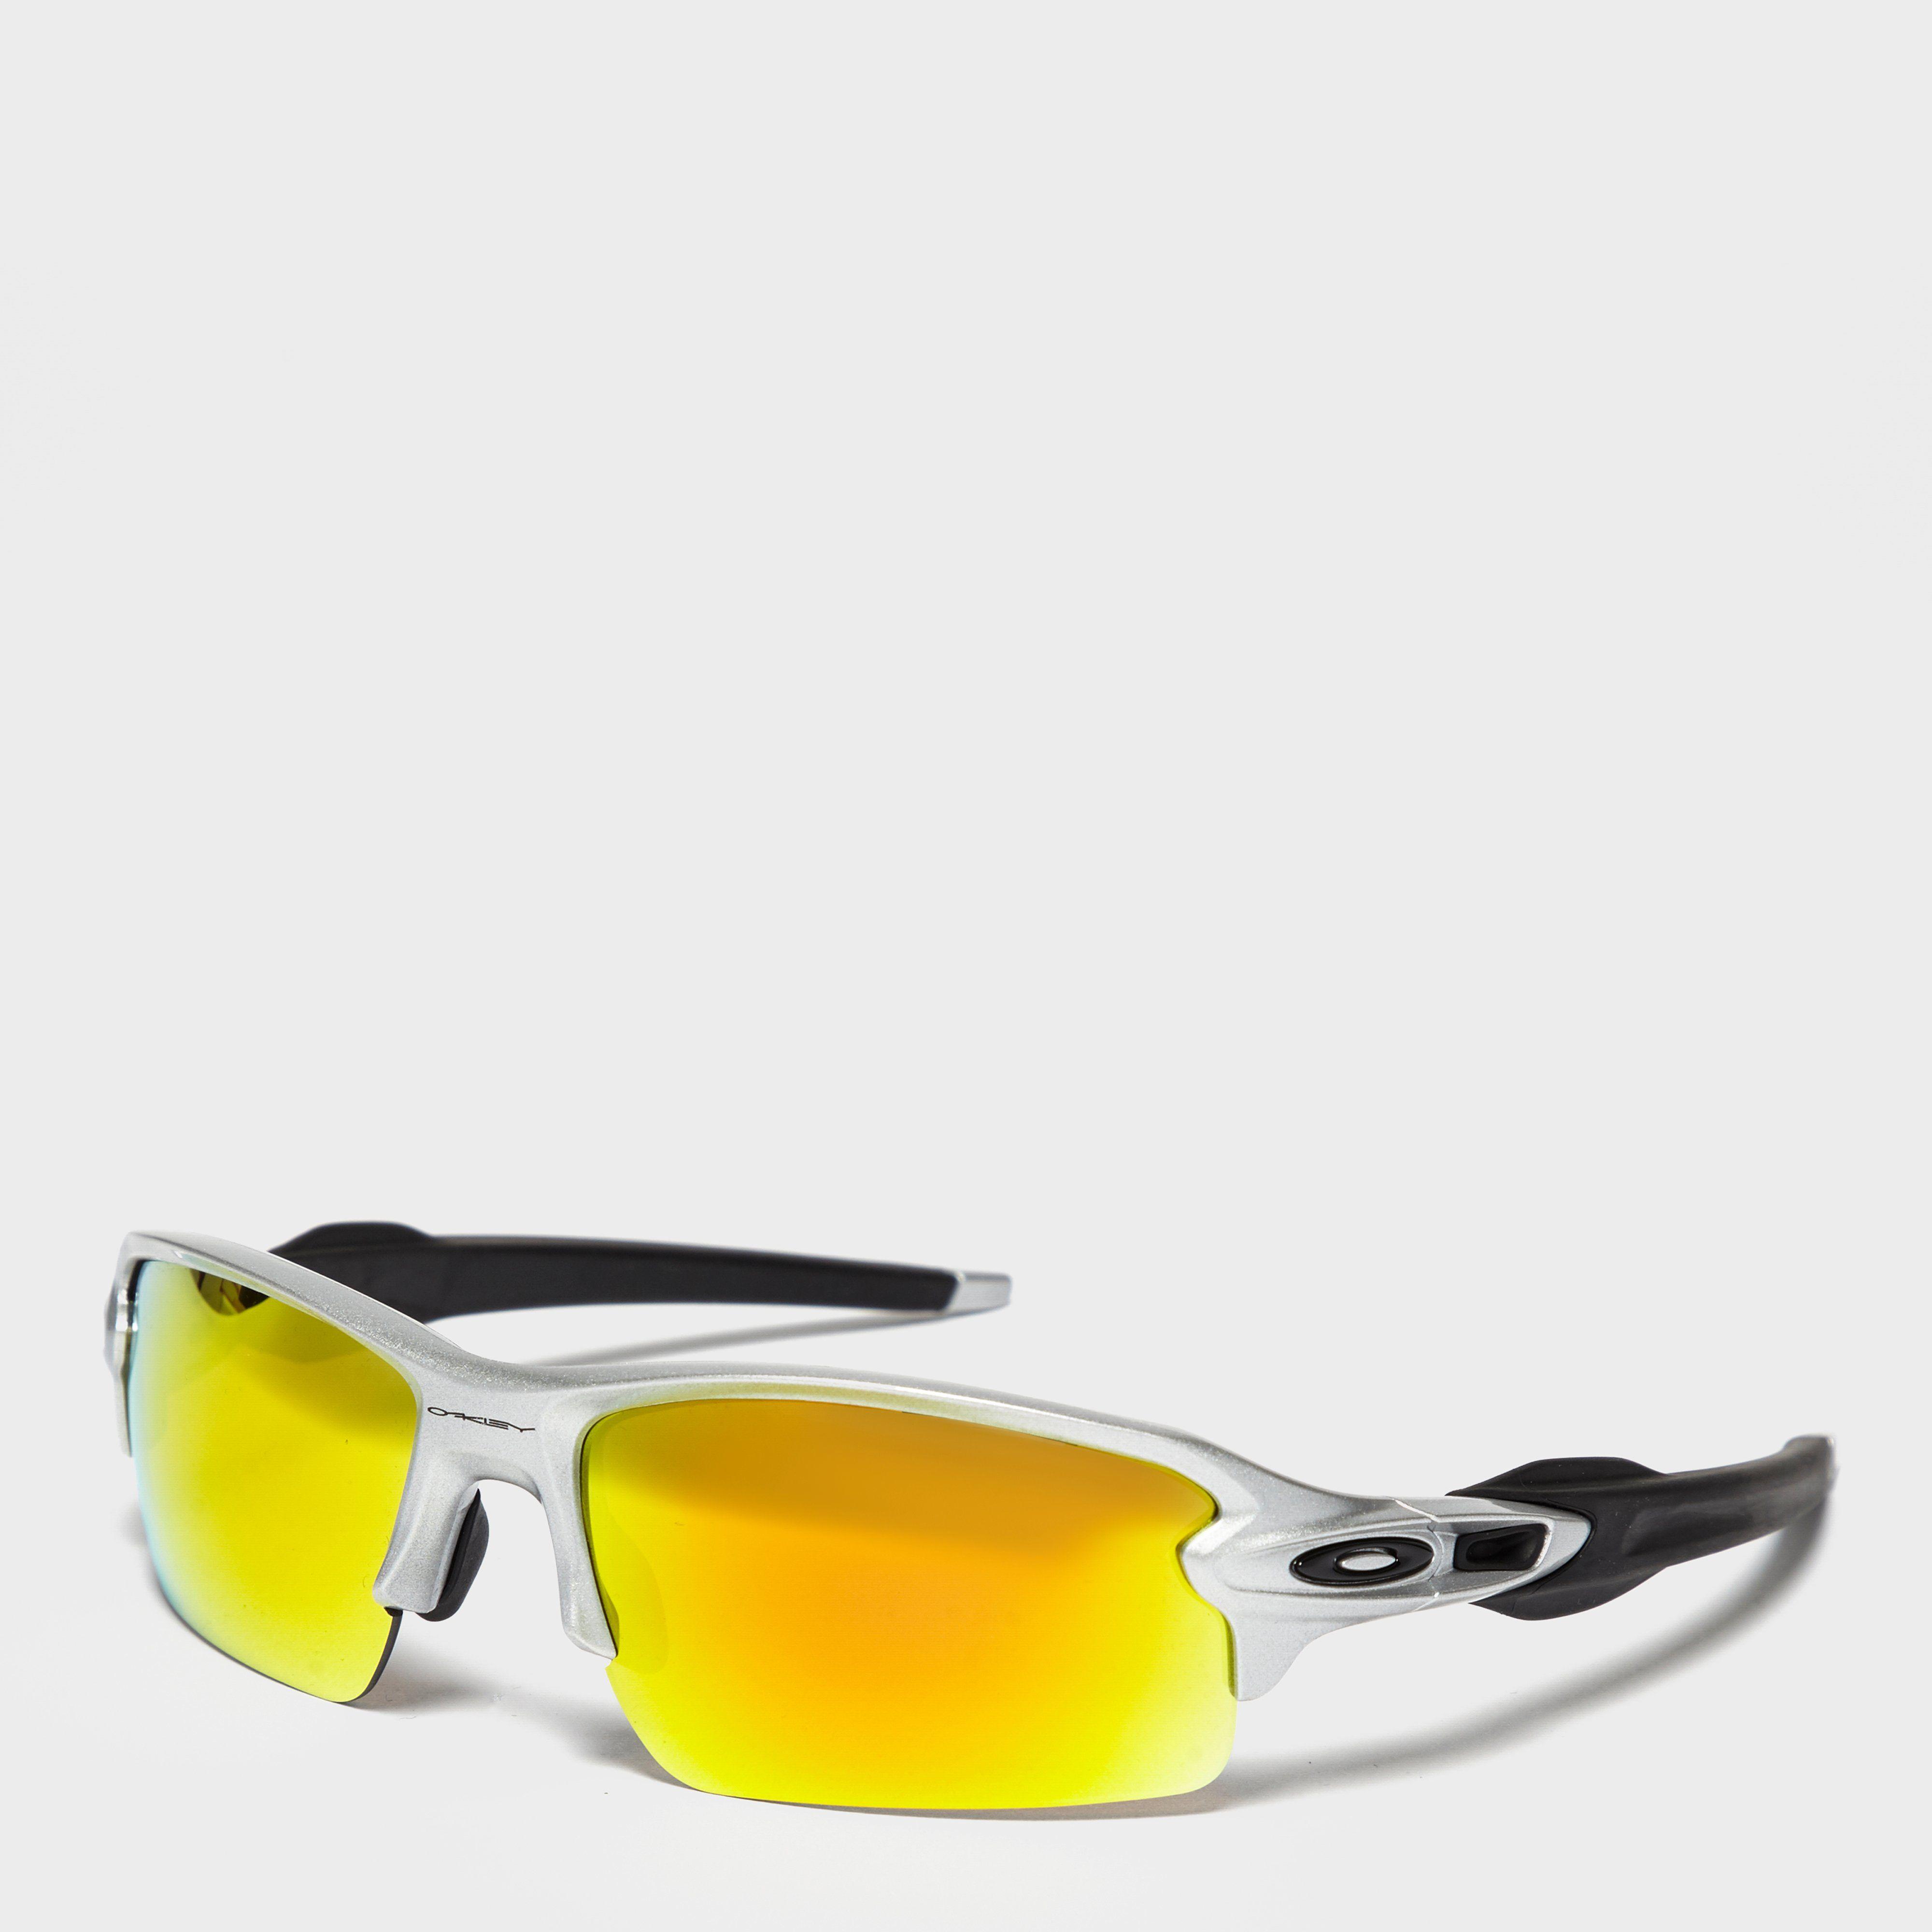 OAKLEY Flak™ 2.0 Fire Iridium Sunglasses